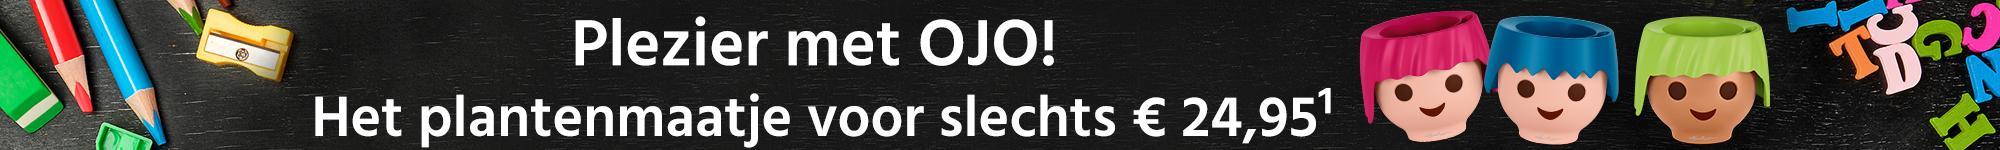 le_listing_banner_promo_ojo_062020_nl